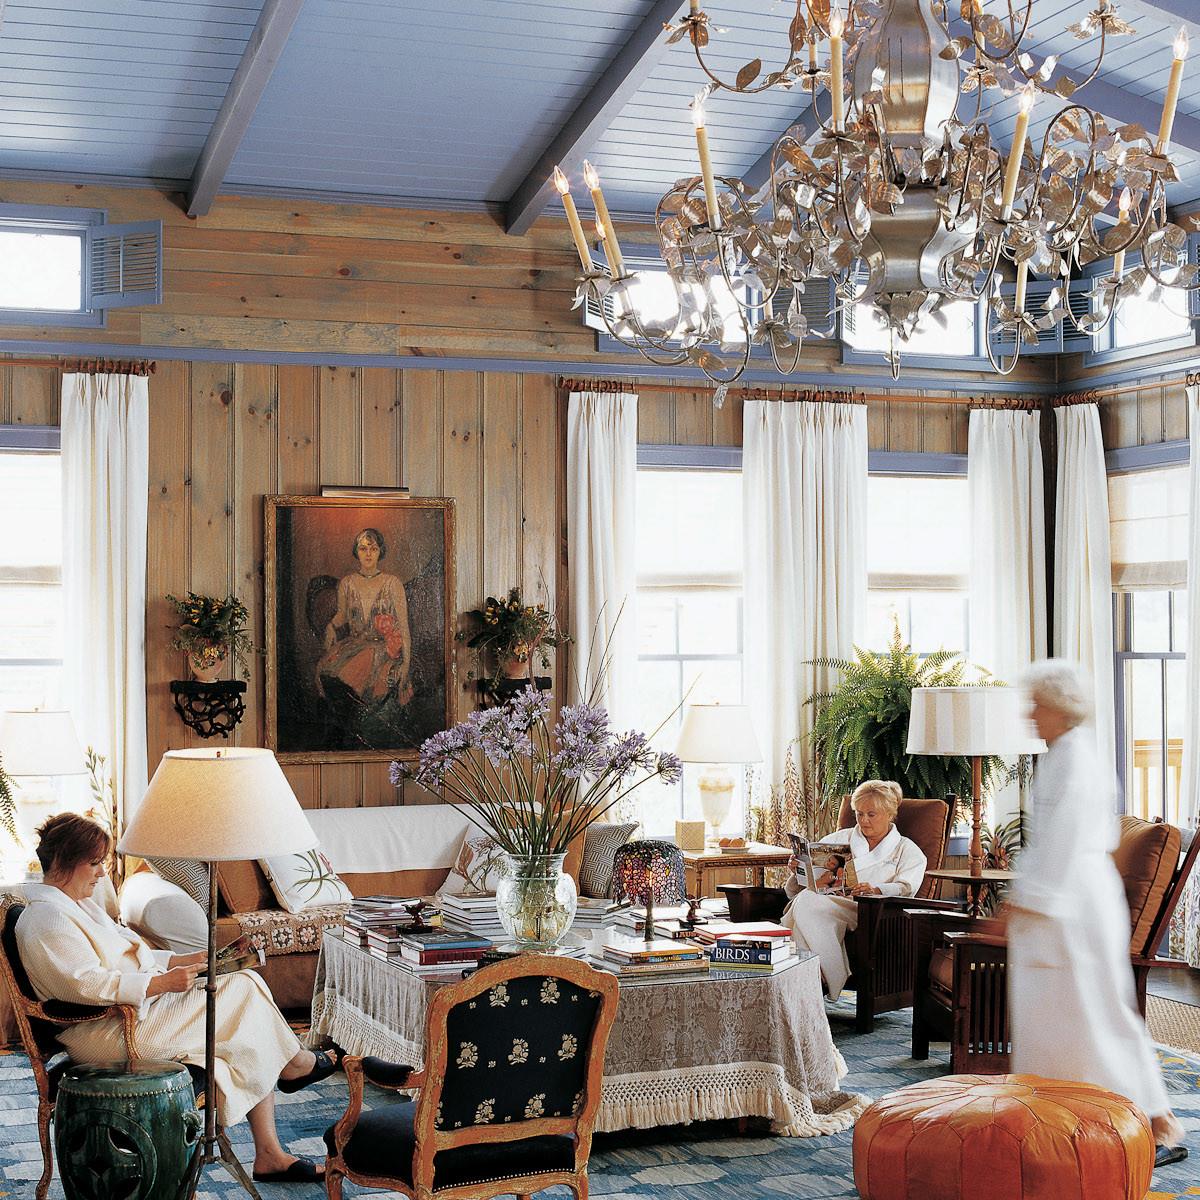 News_Lake Austin Spa_chandelier